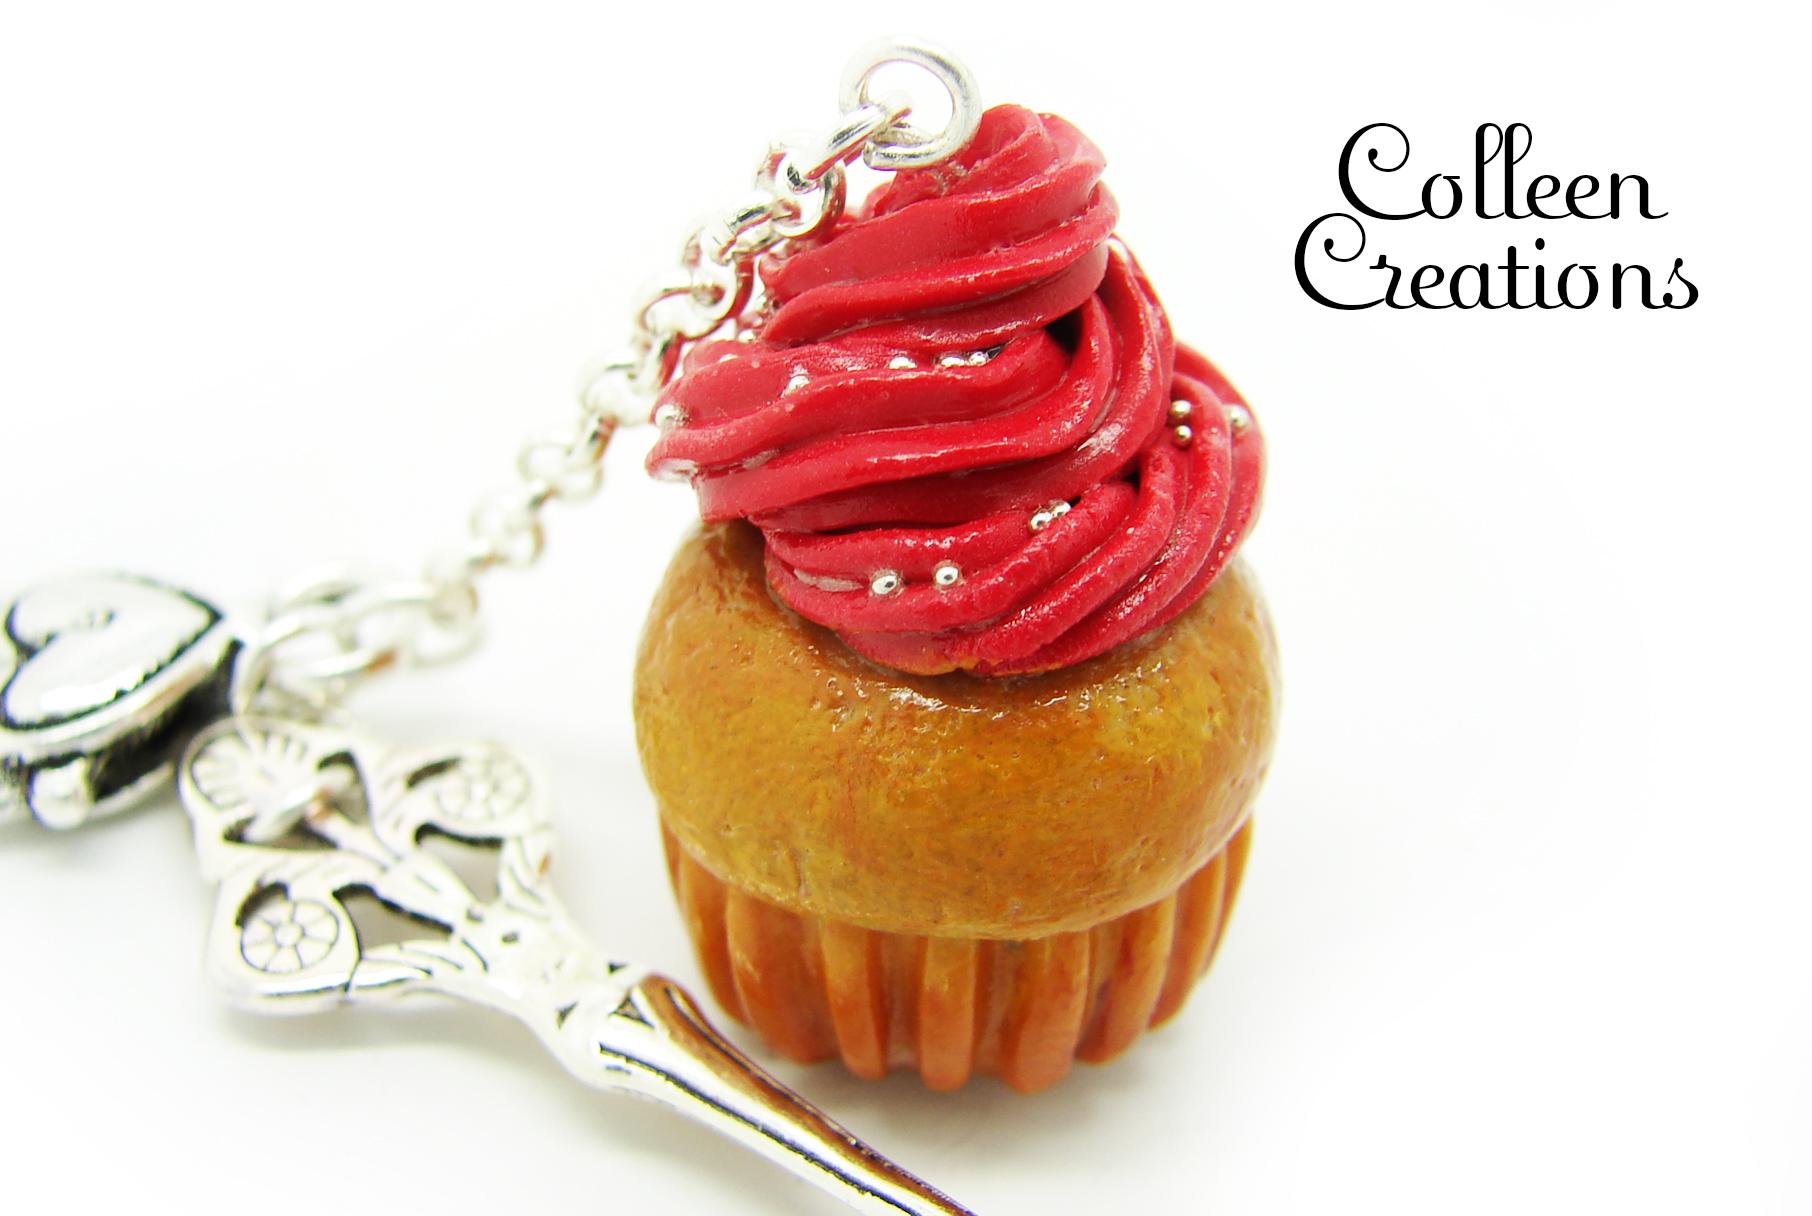 bijoux-sac-cupcake-cuillere-fraise2